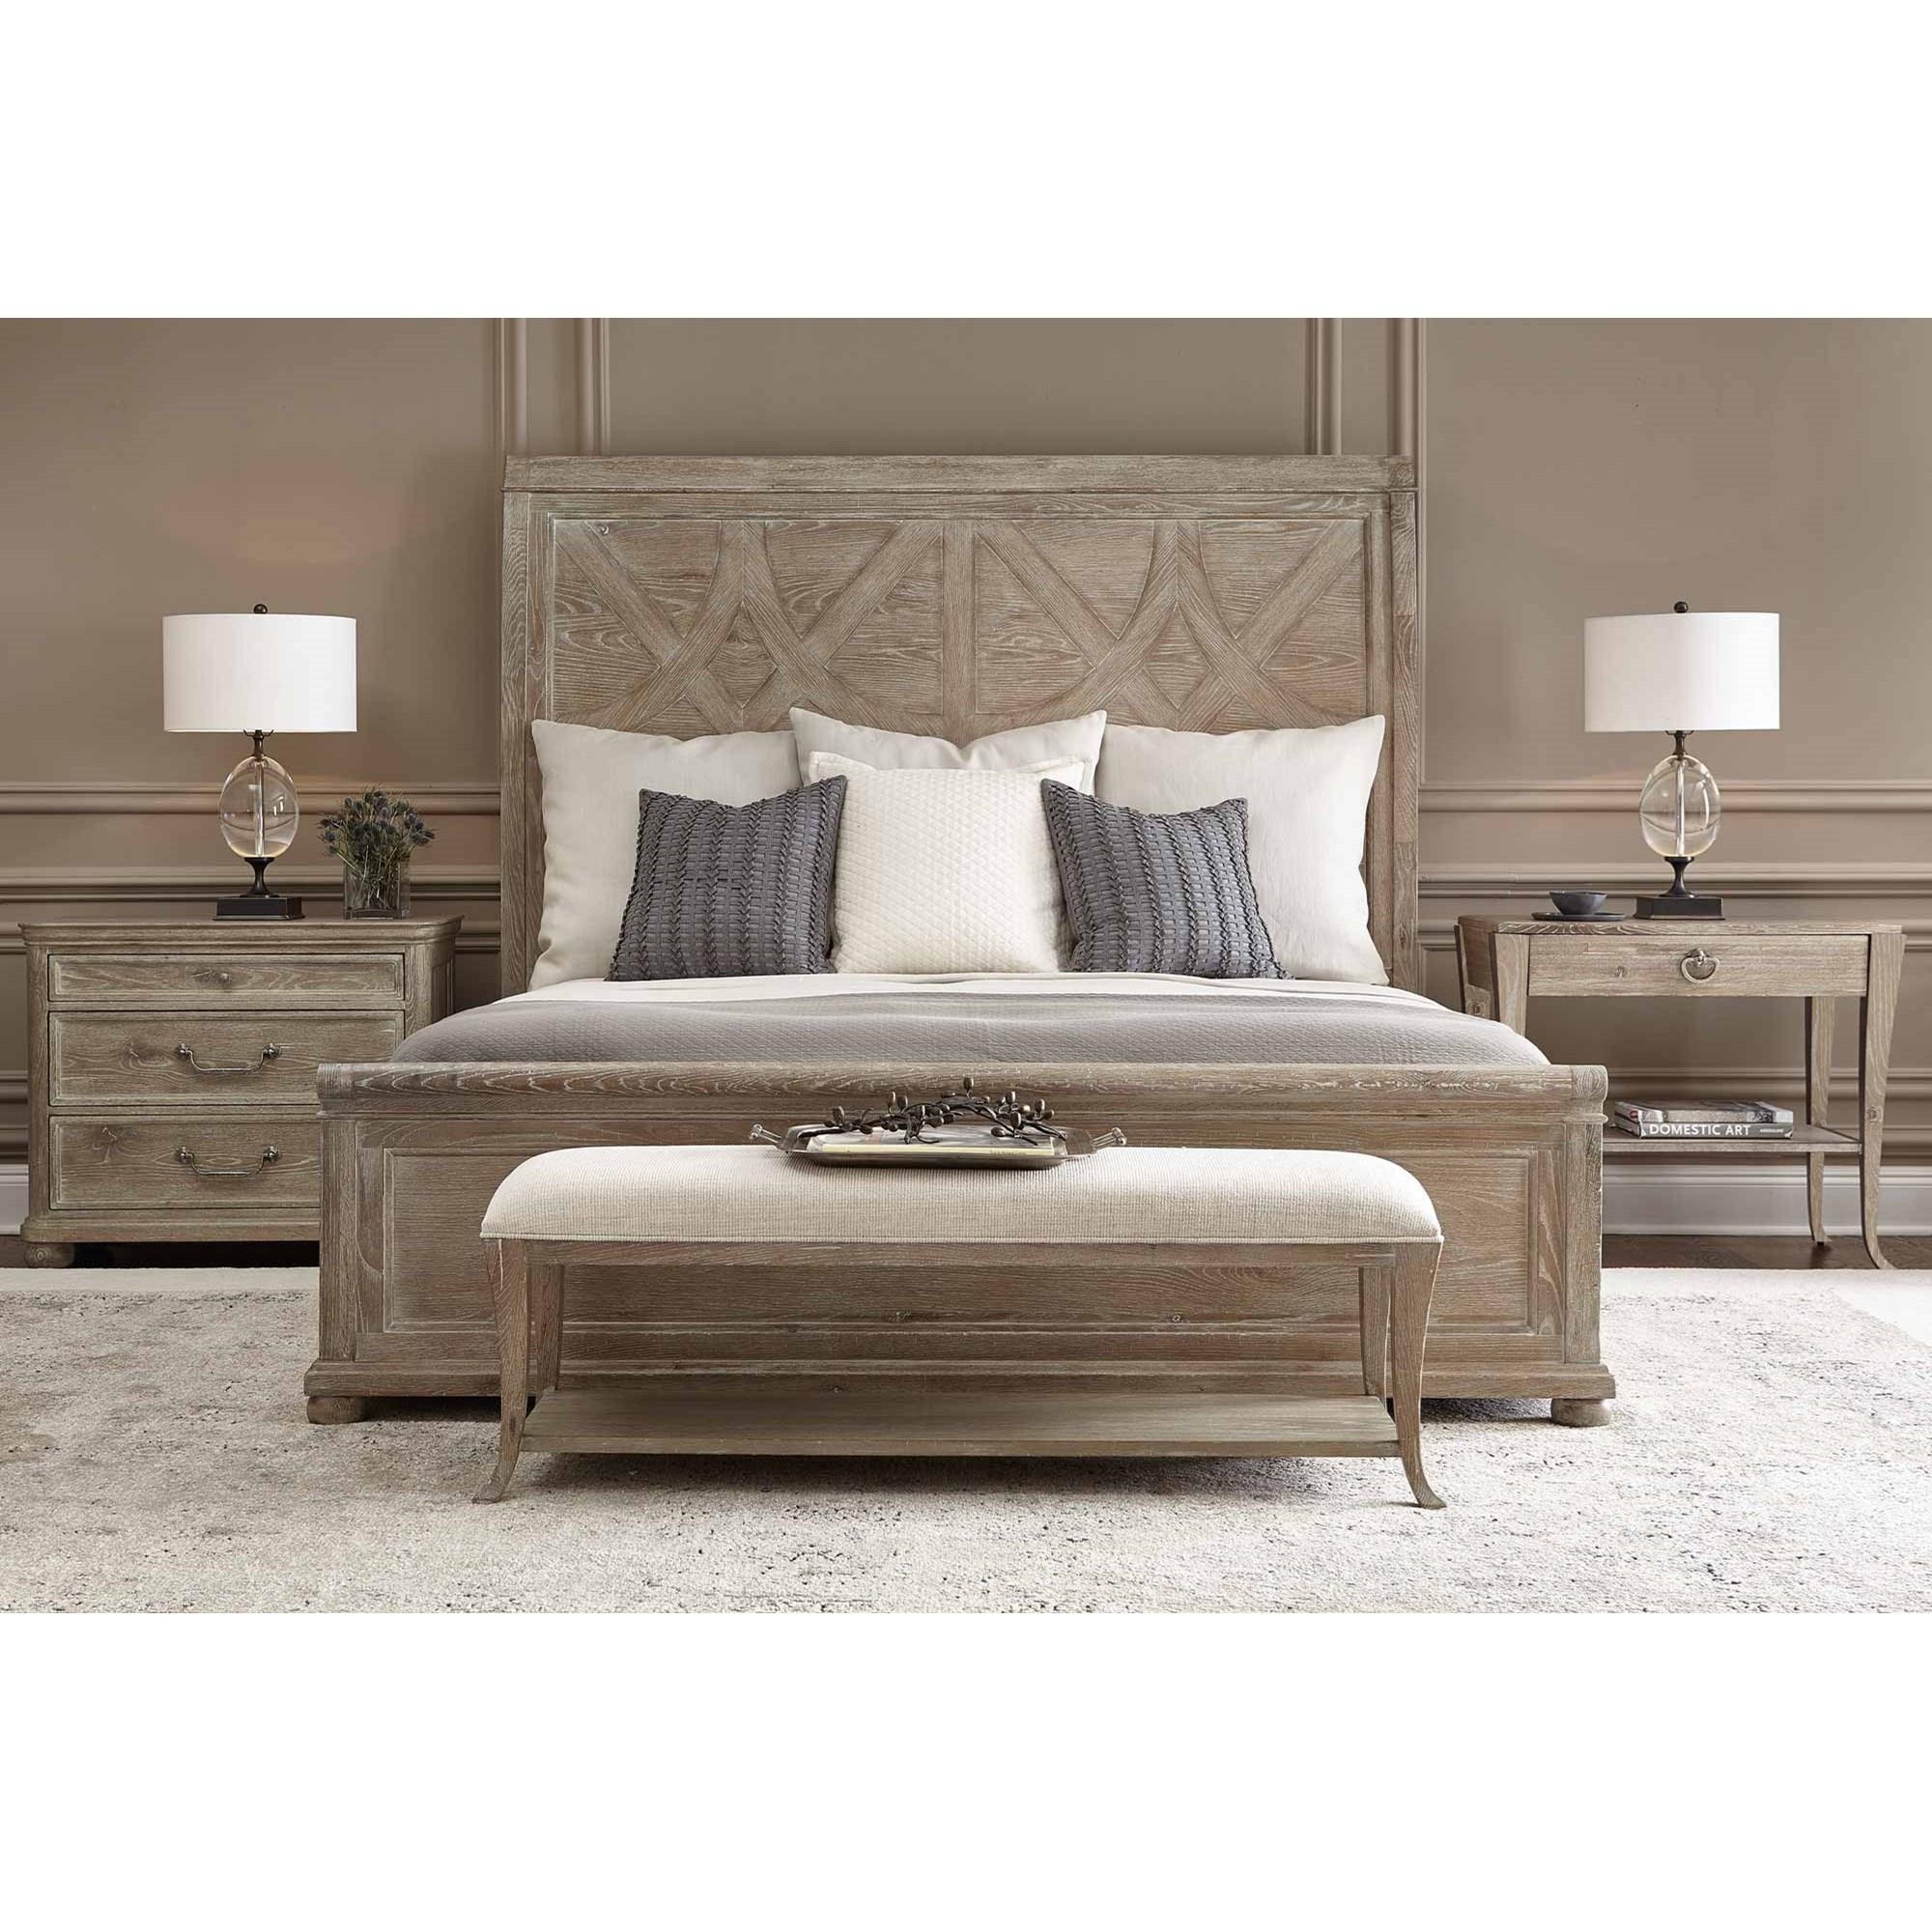 Bernhardt Rustic Patina California King Bedroom Group Dunk Bright Furniture Bedroom Groups